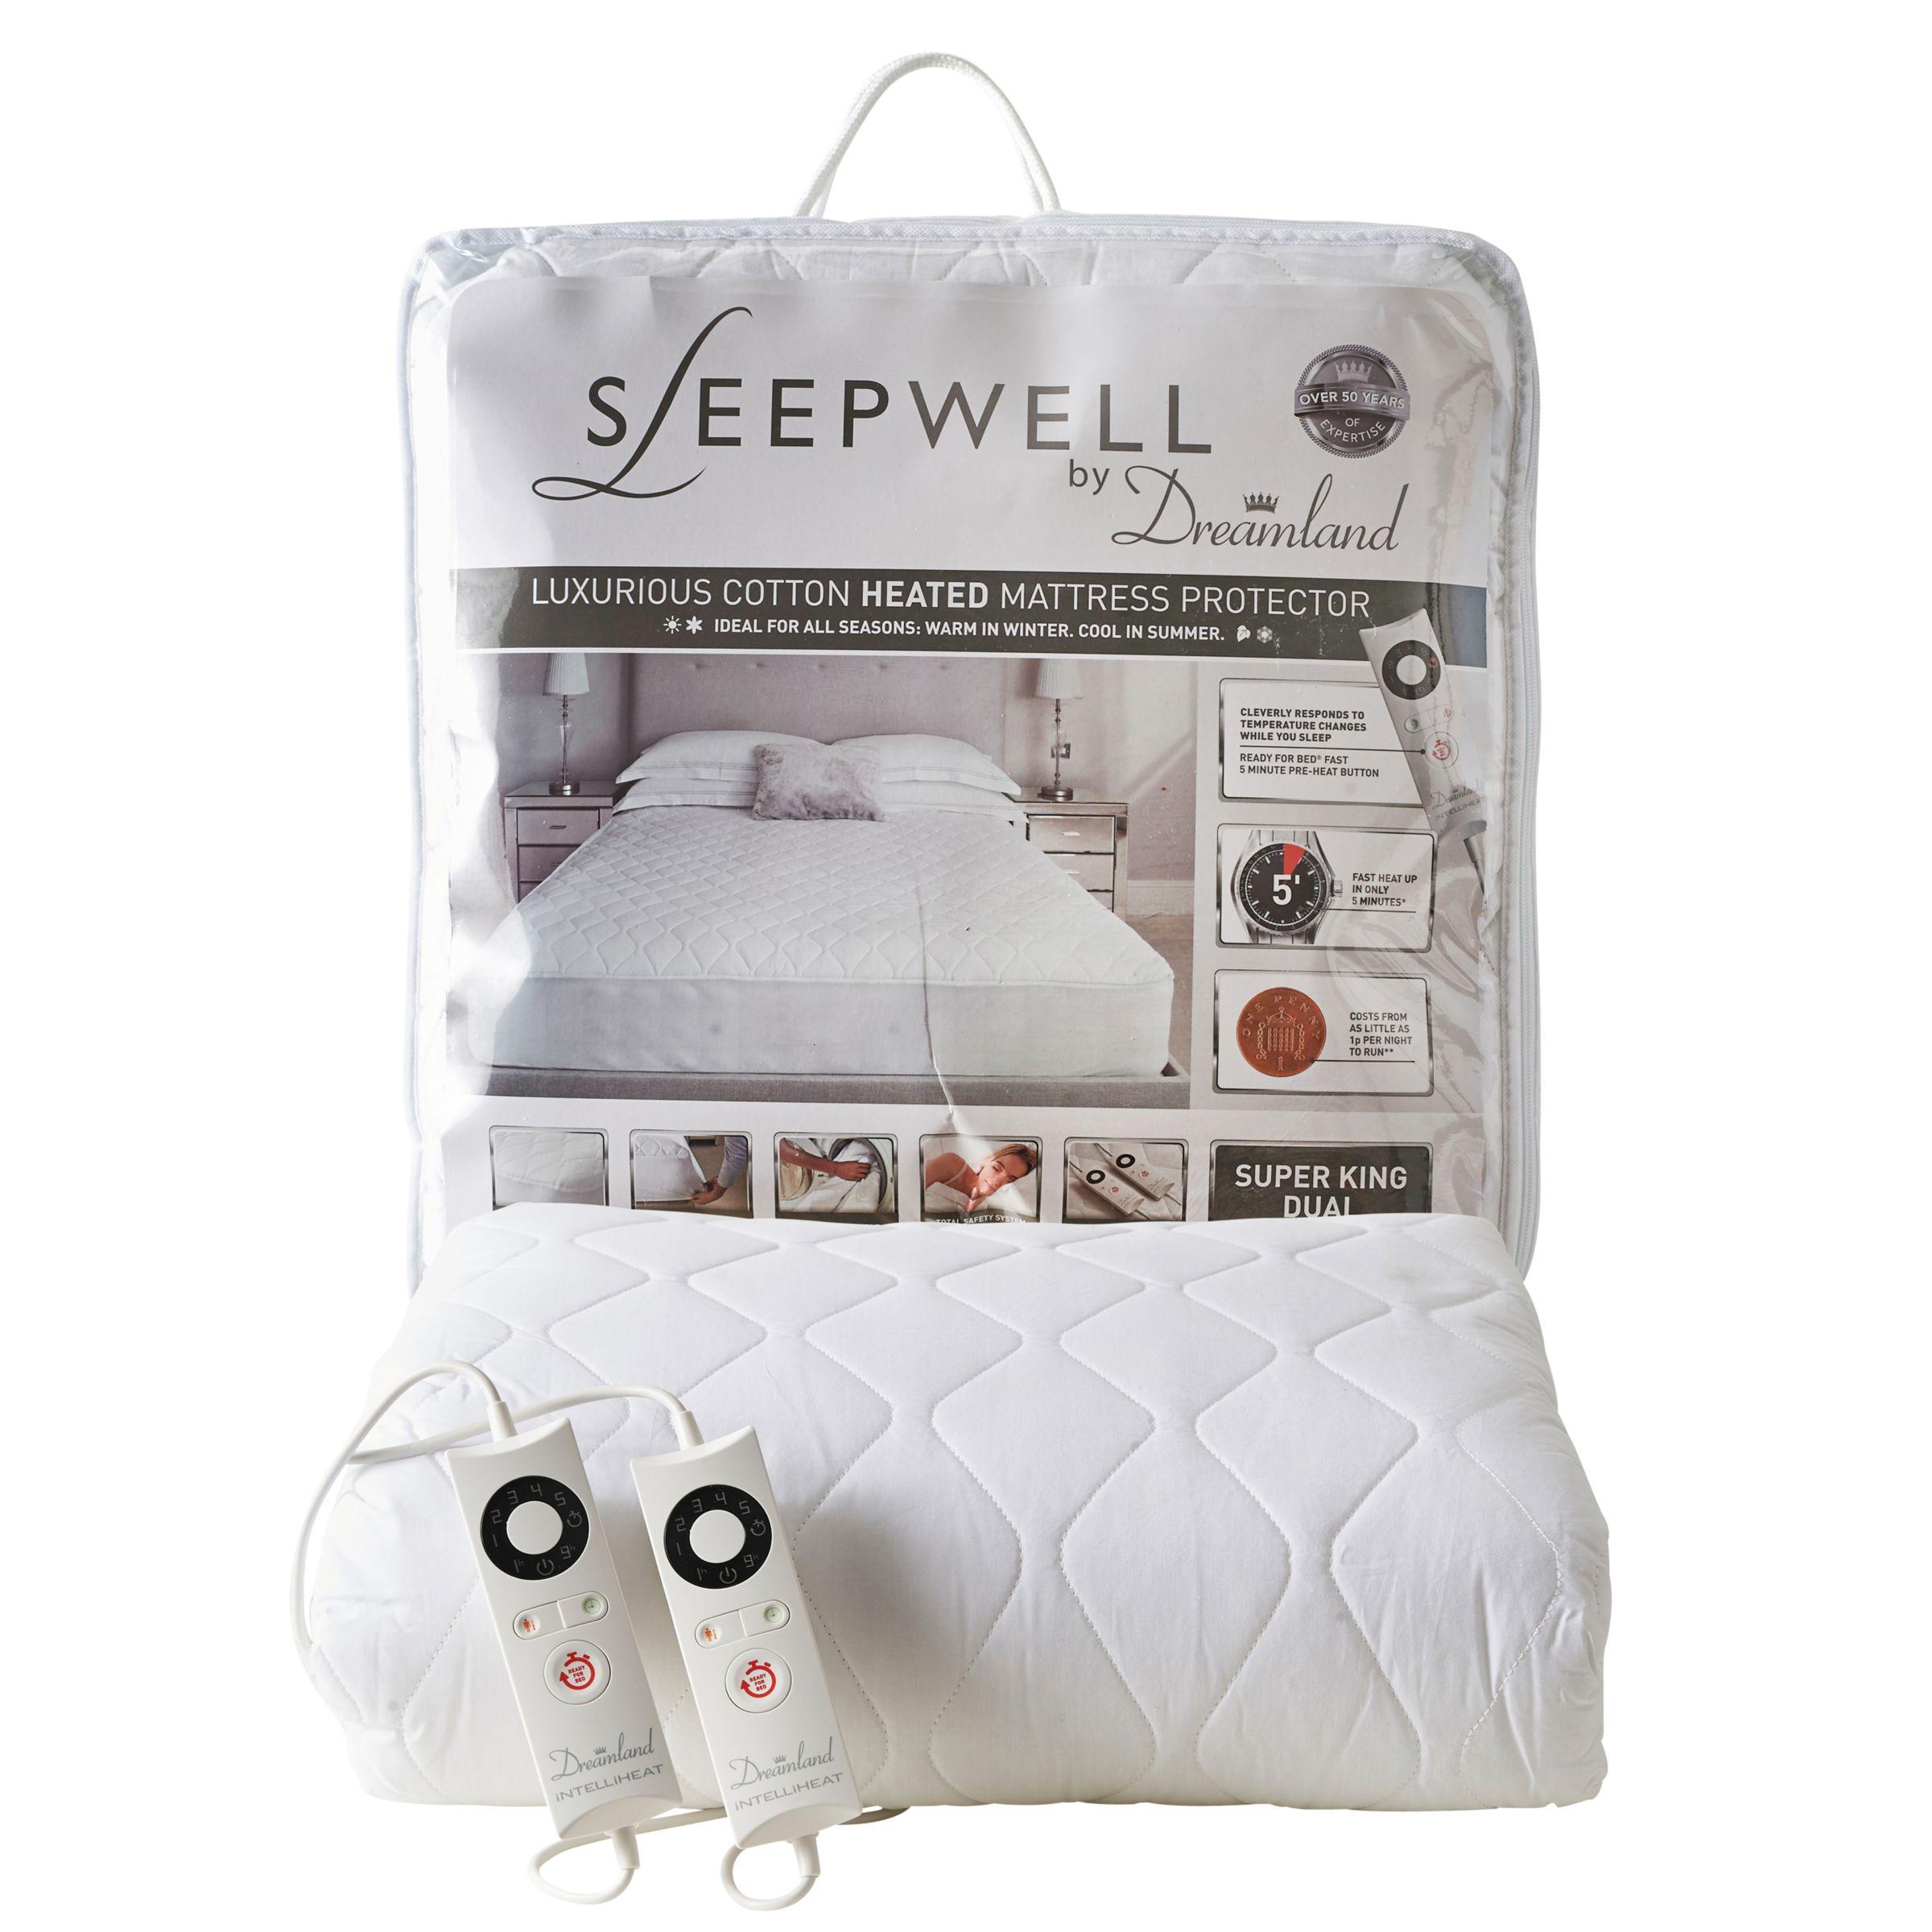 Dreamland Dreamland Sleepwell Dual Control Heated Mattress Protector